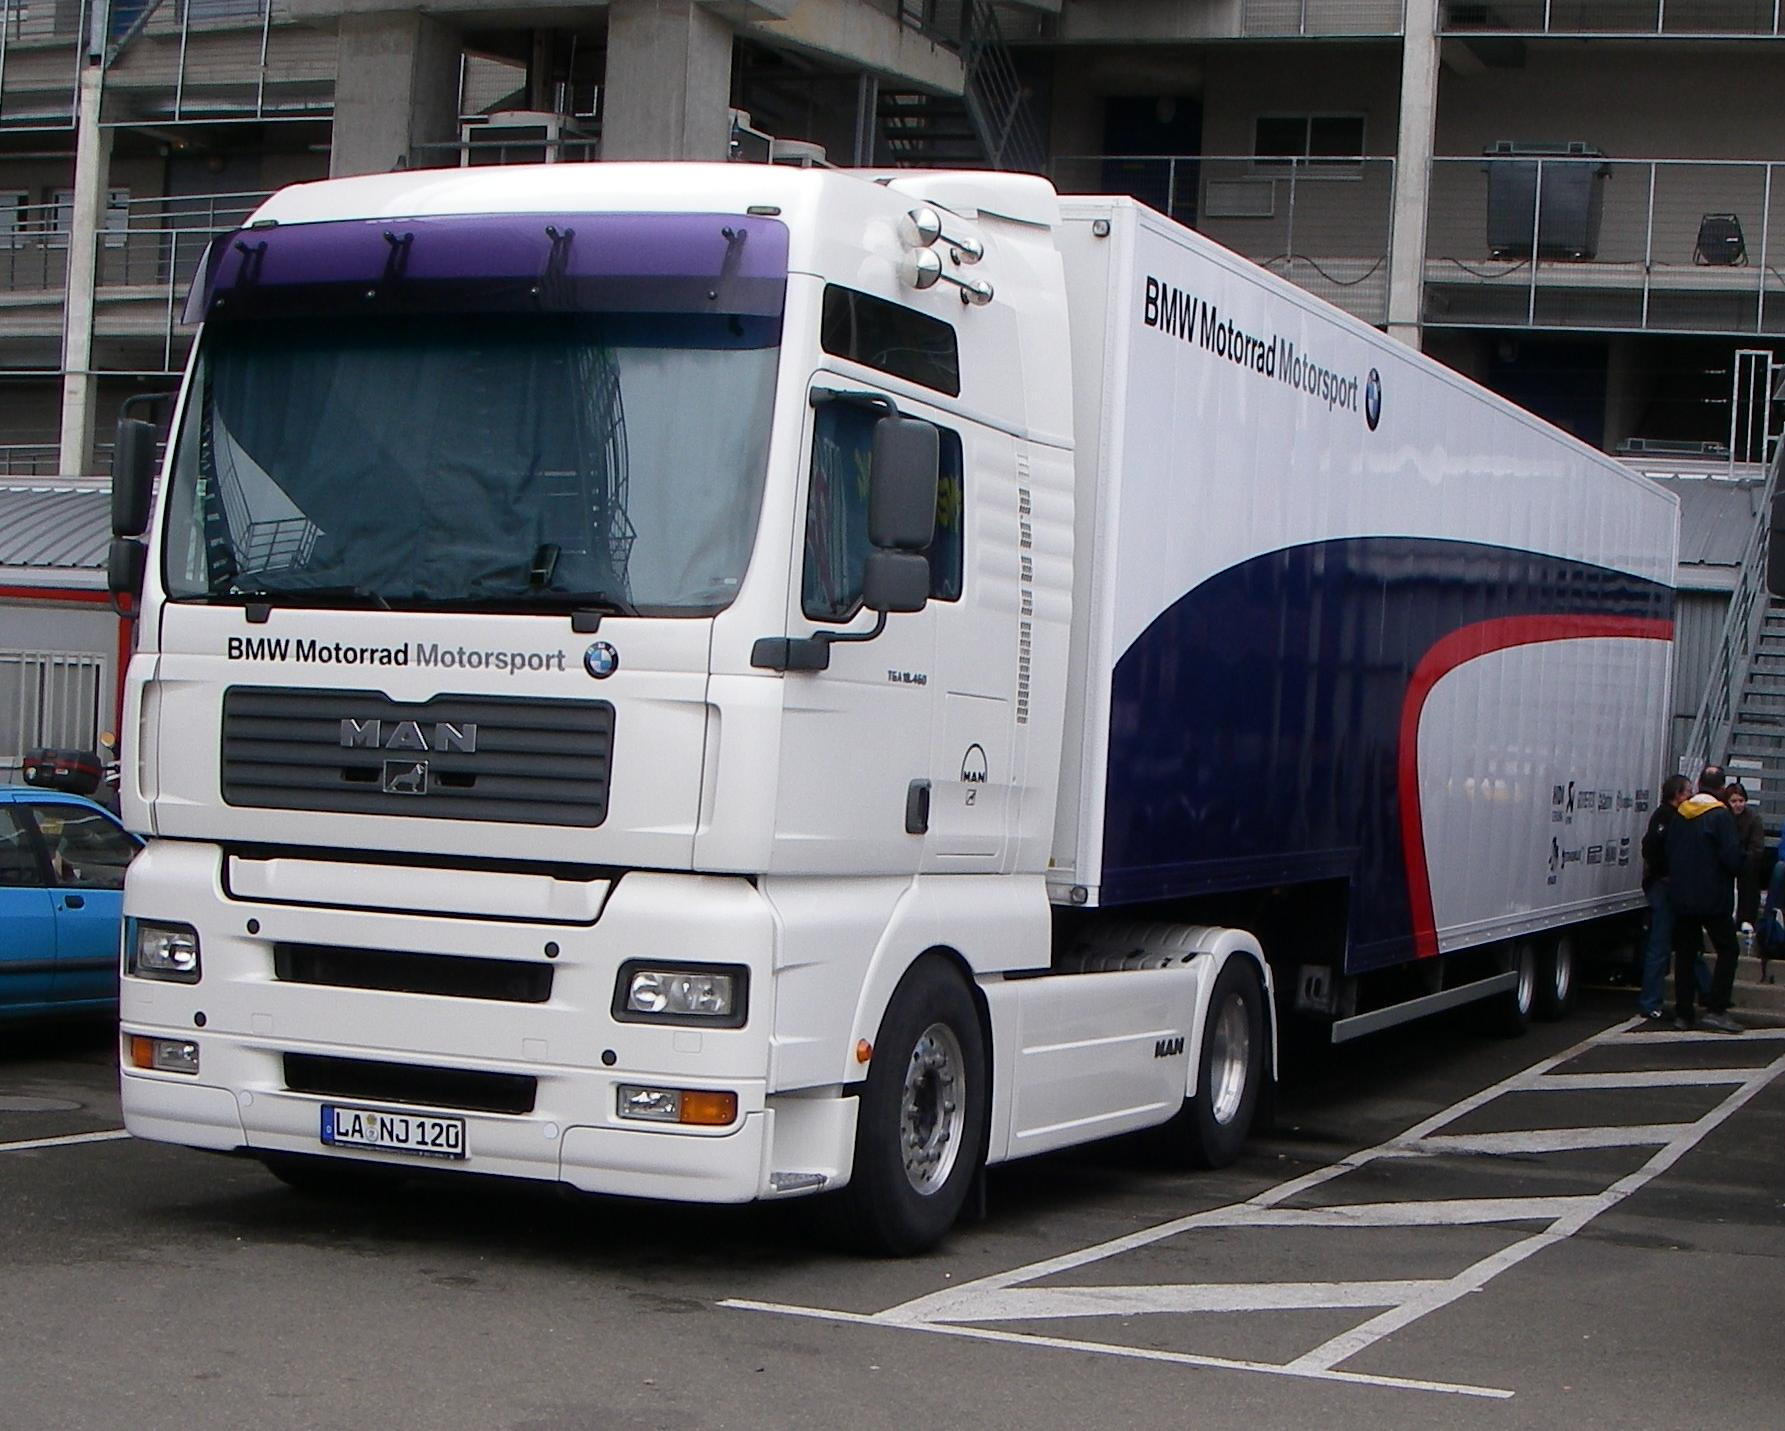 File Bmw Motorrad Motorsport Endurance Truck Jpg